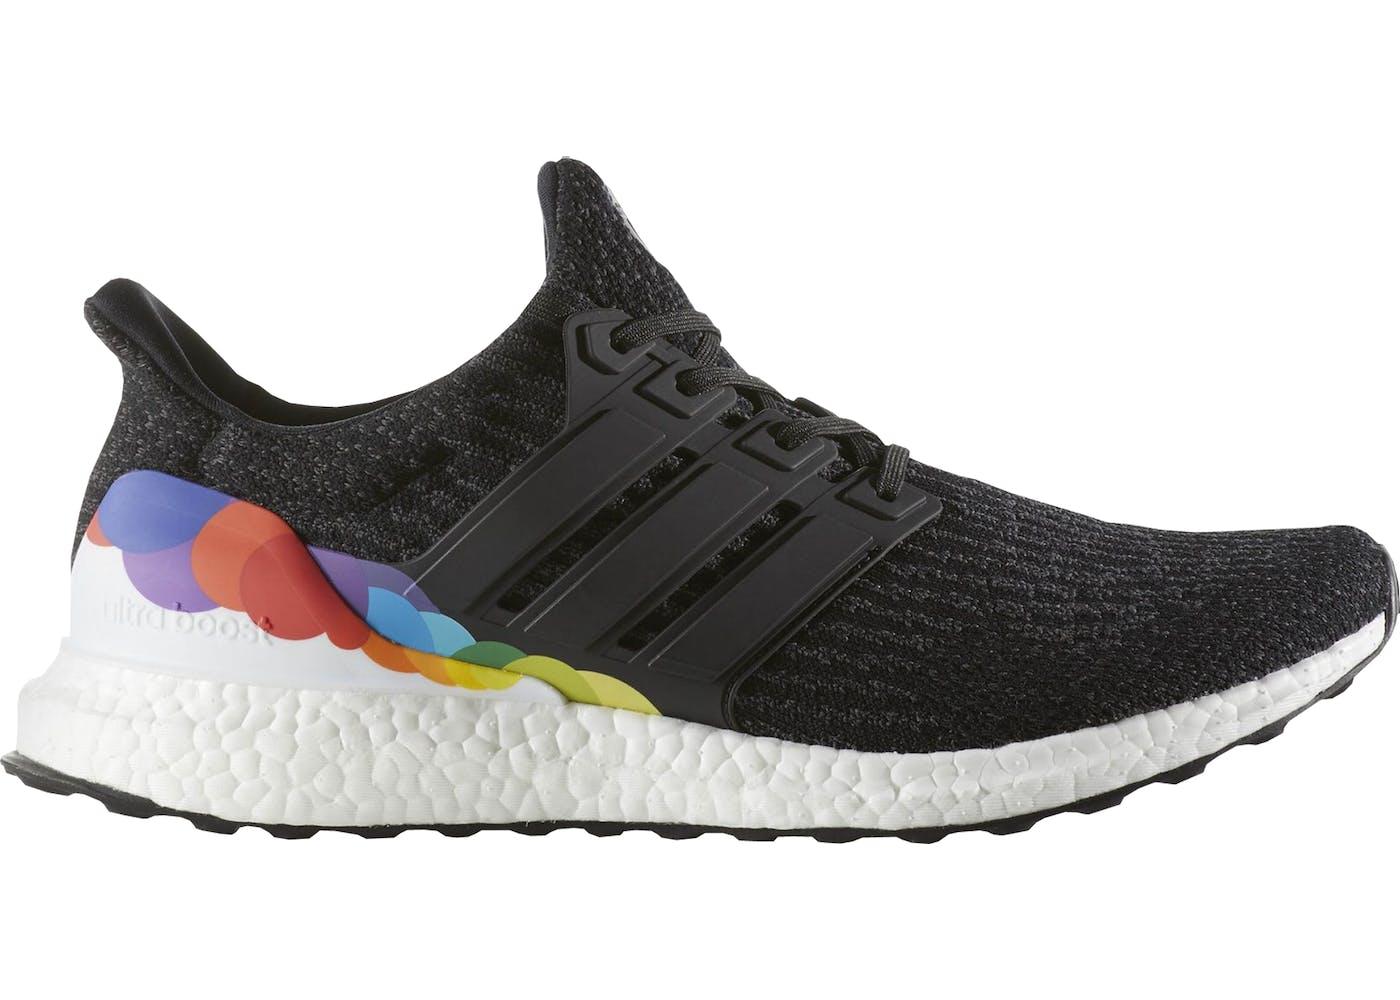 Adidas Ultra Boost 3.0 LGBT Pride